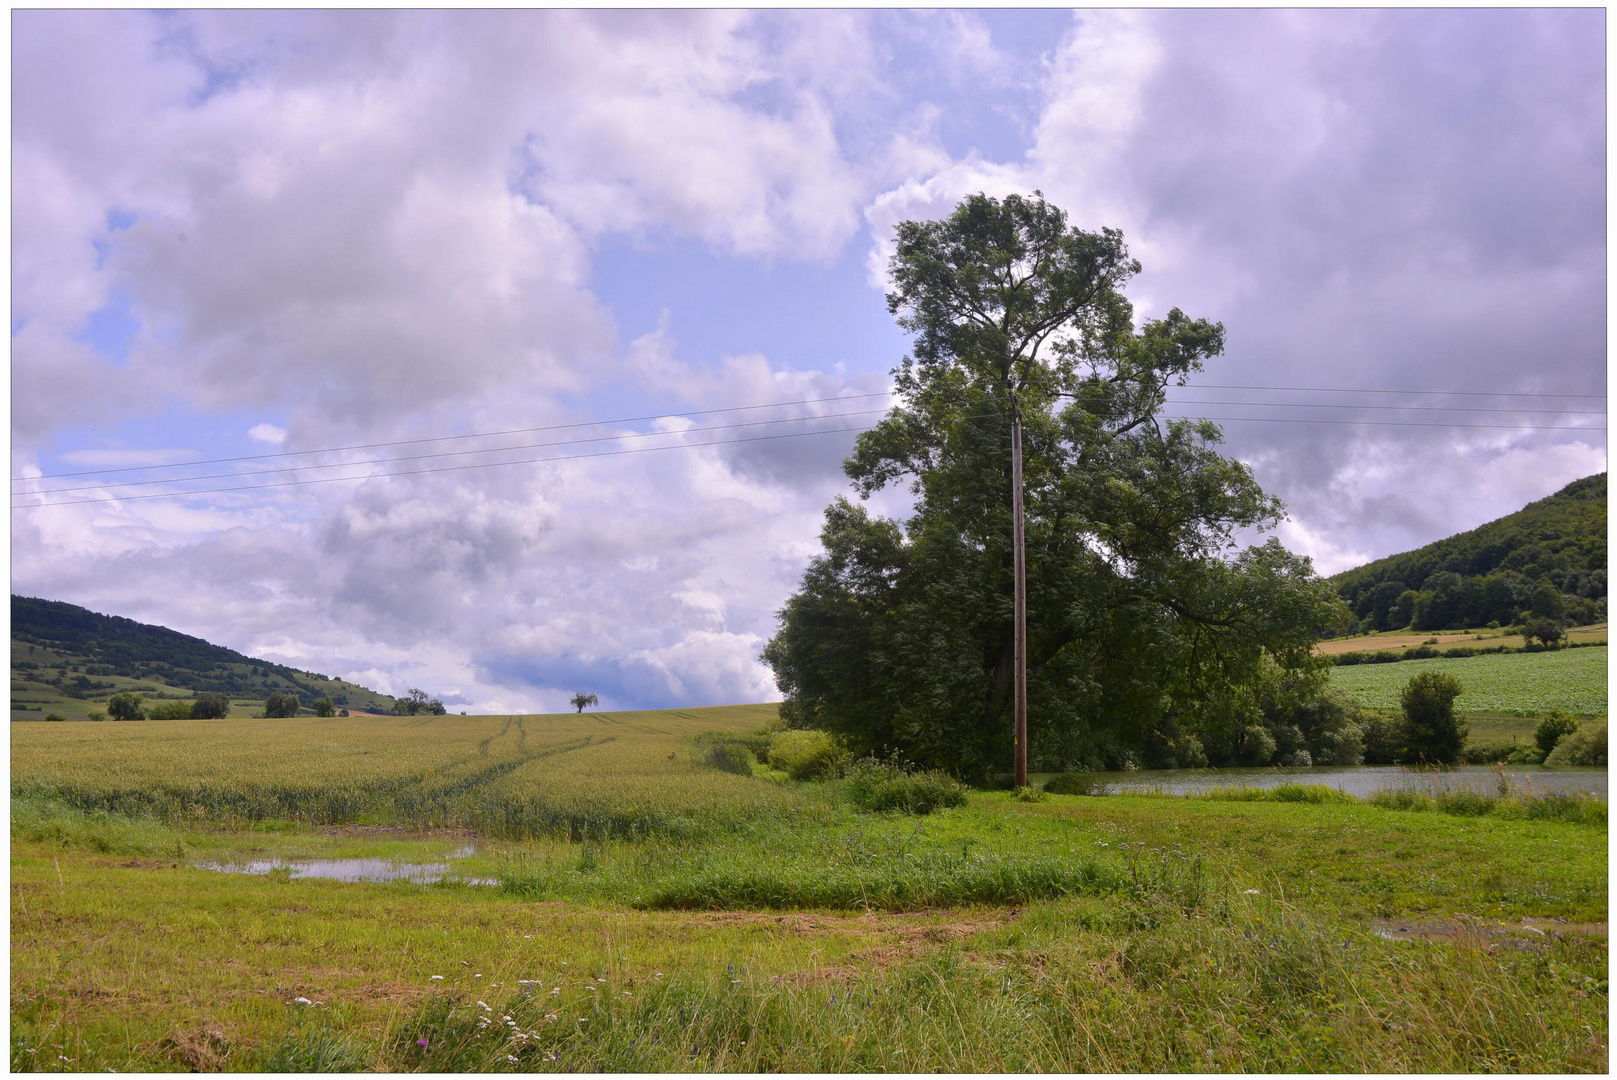 Paisaje en el lago (Landschaft am See)